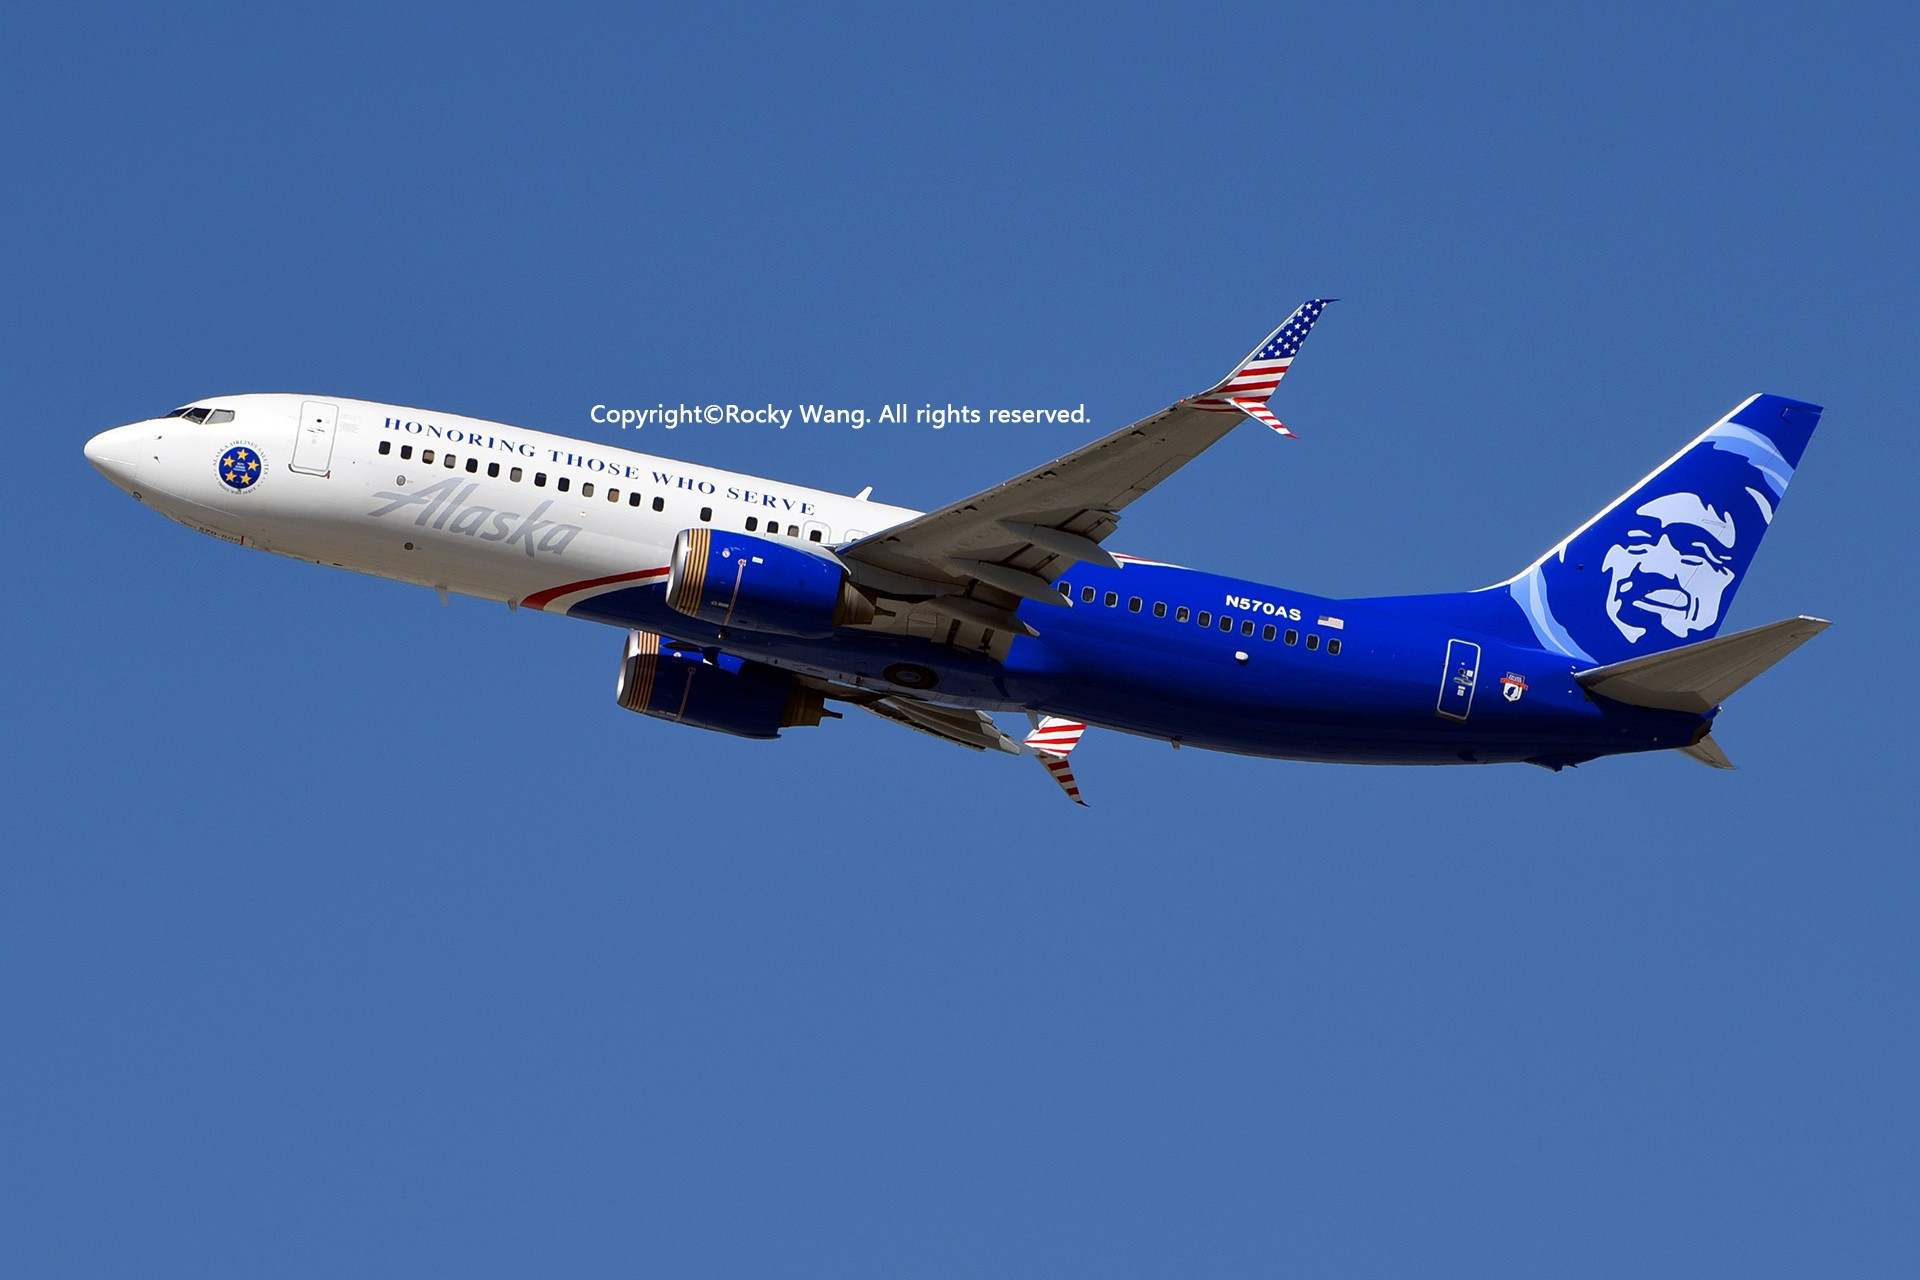 Re:[原创]彩绘圣地-附加彩蛋 BOEING 737-890 N570AS Los Angeles Int'l Airport